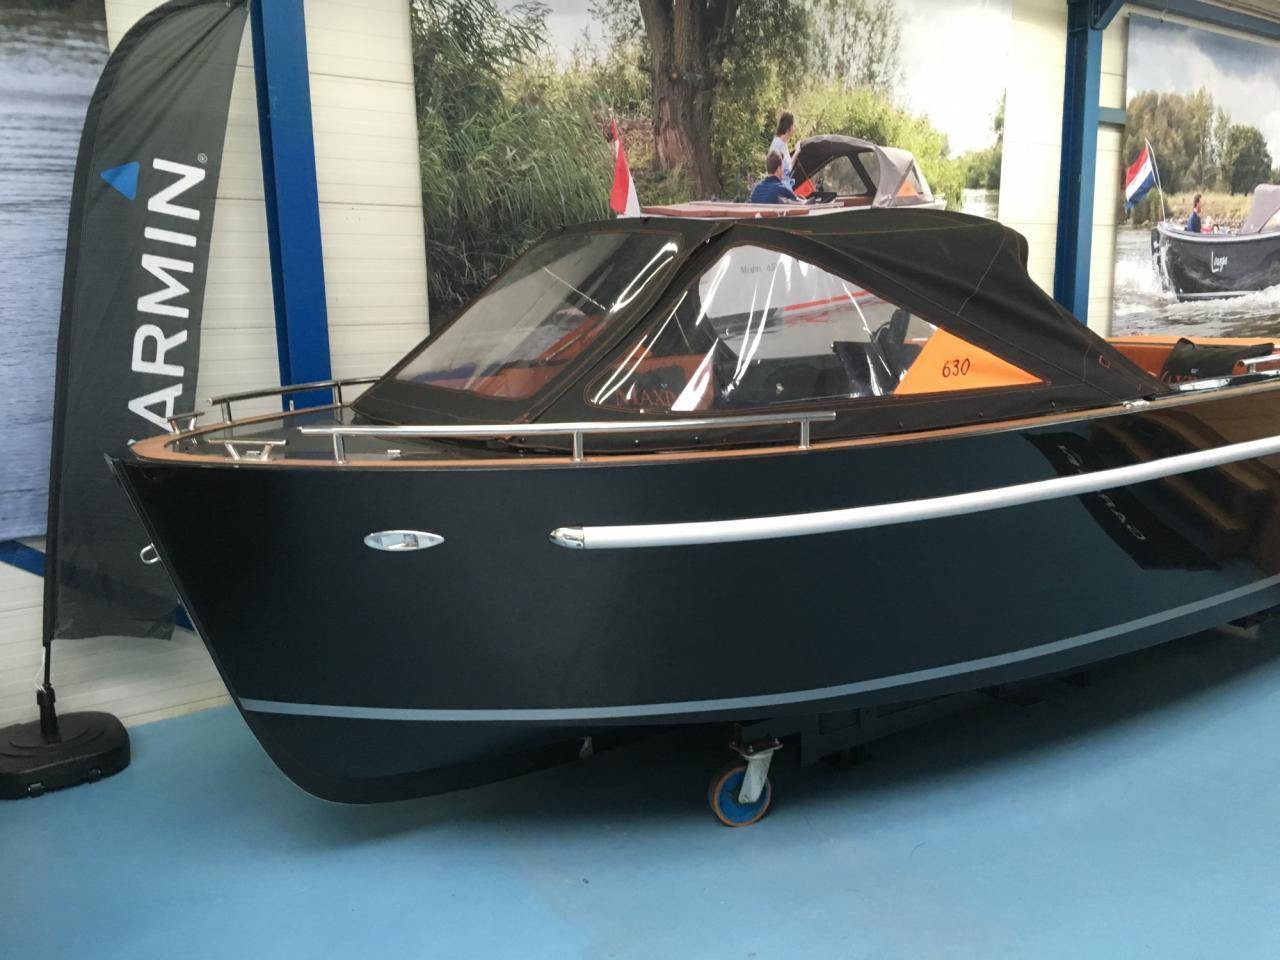 Maxima 630 zwart met Honda 60 pk in unieke kleurstelling! 2